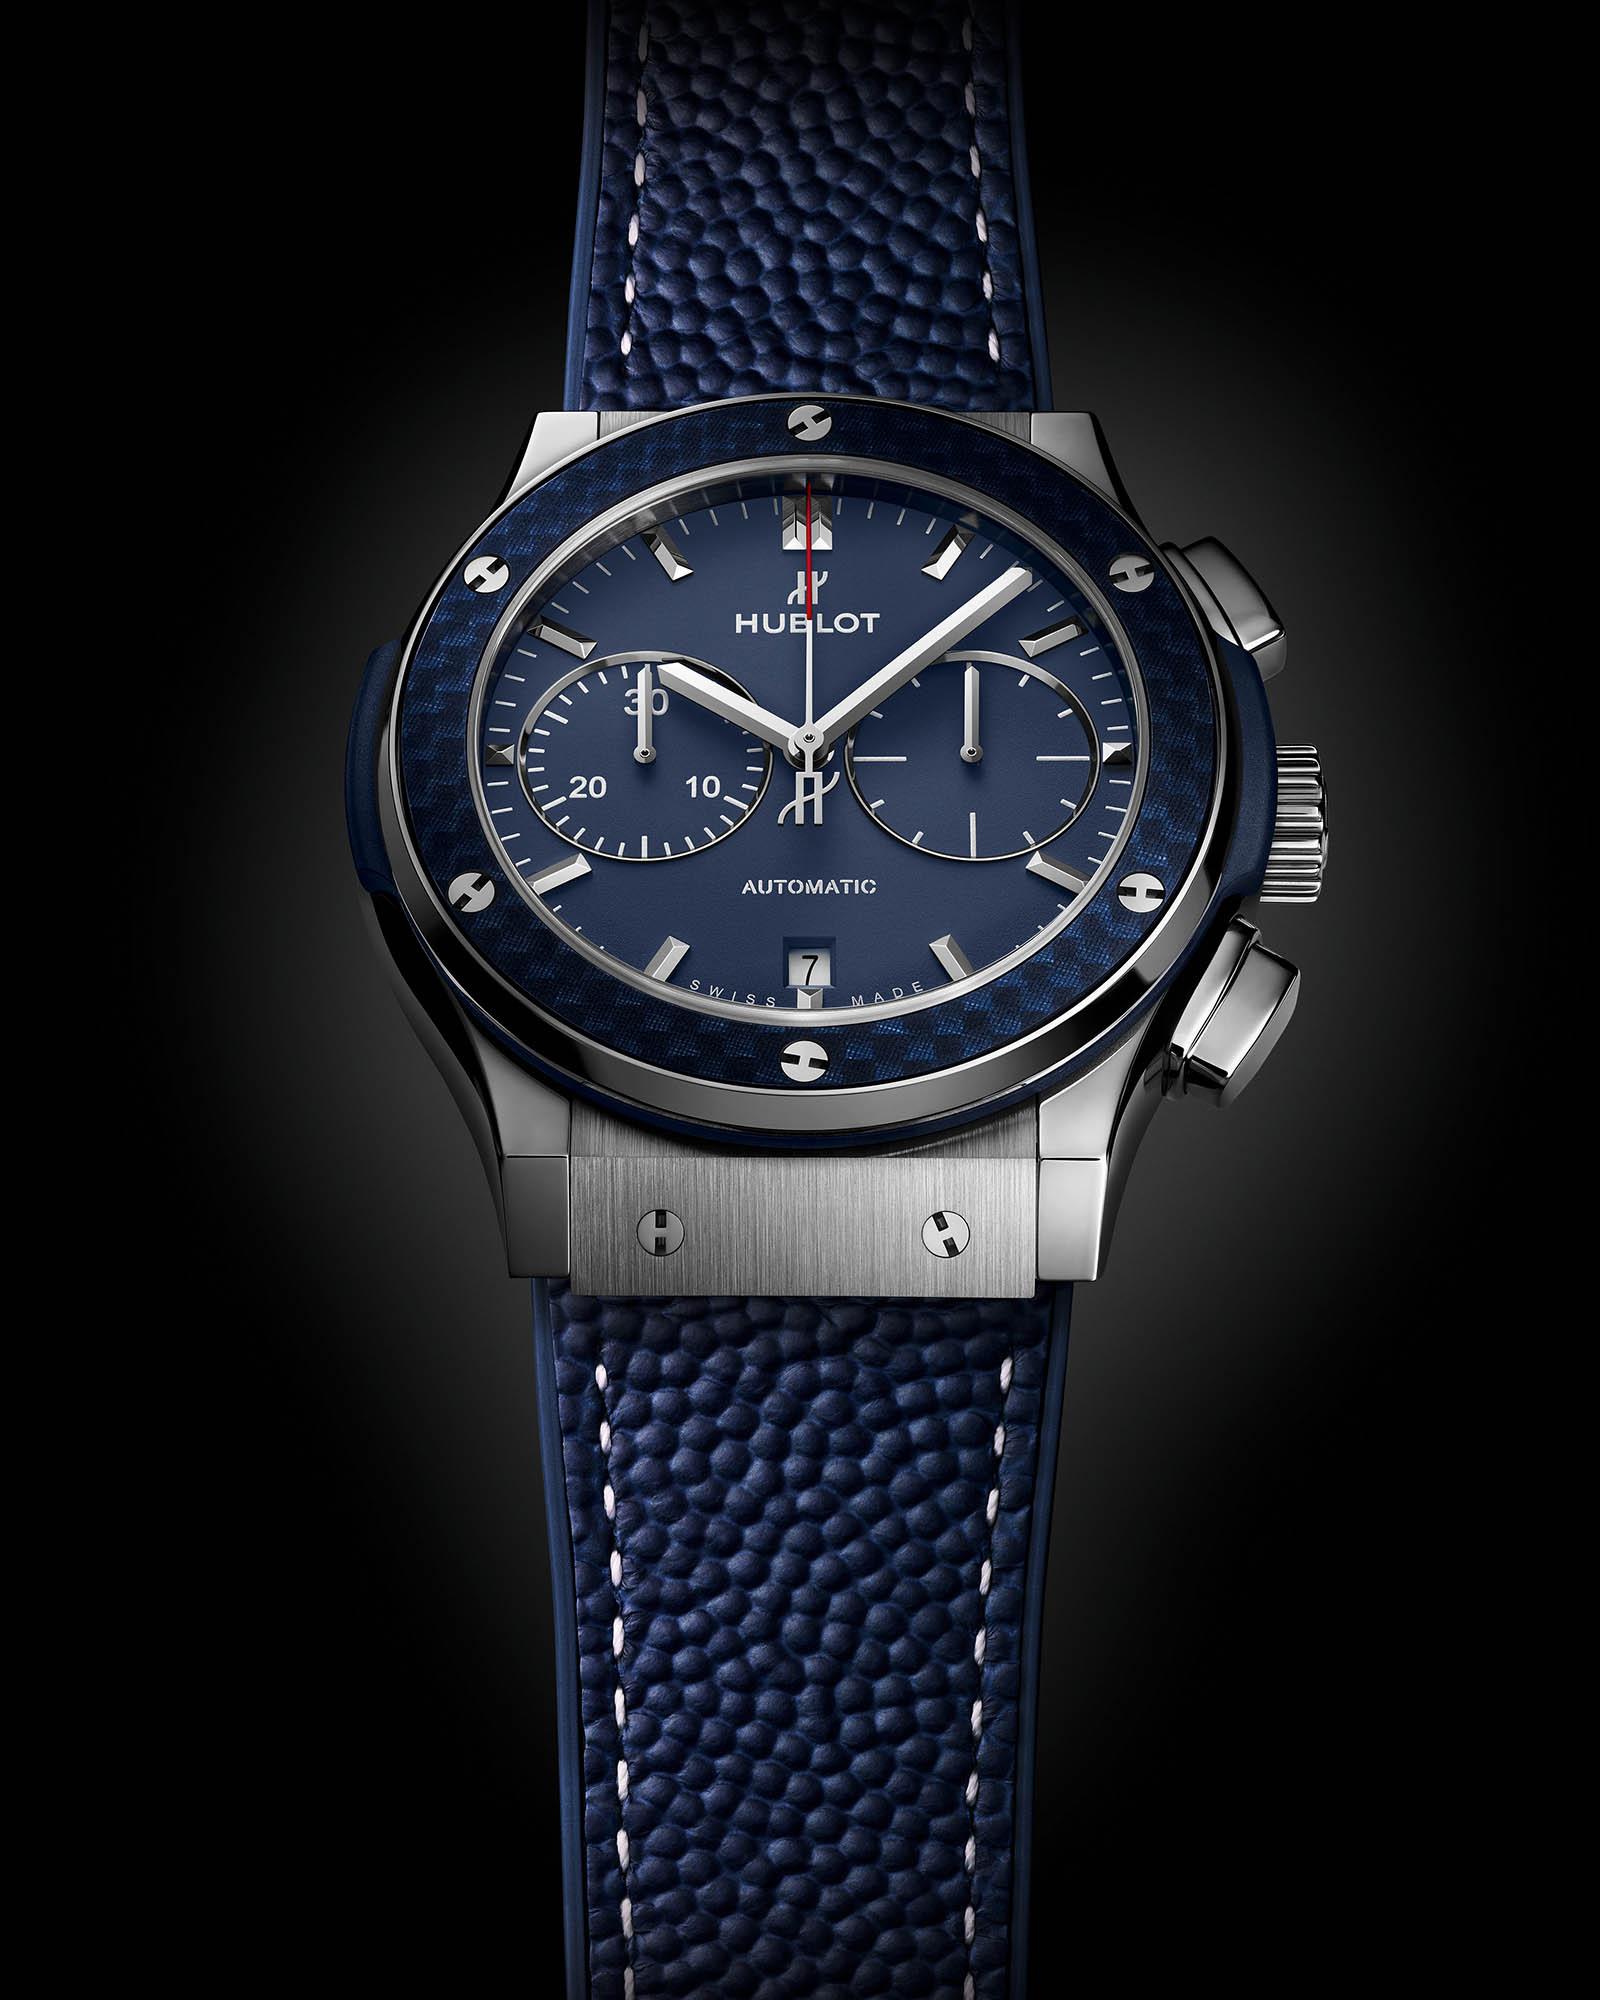 hublot-classic-fusion-chronograph-new-york-eli-manning-3.jpg